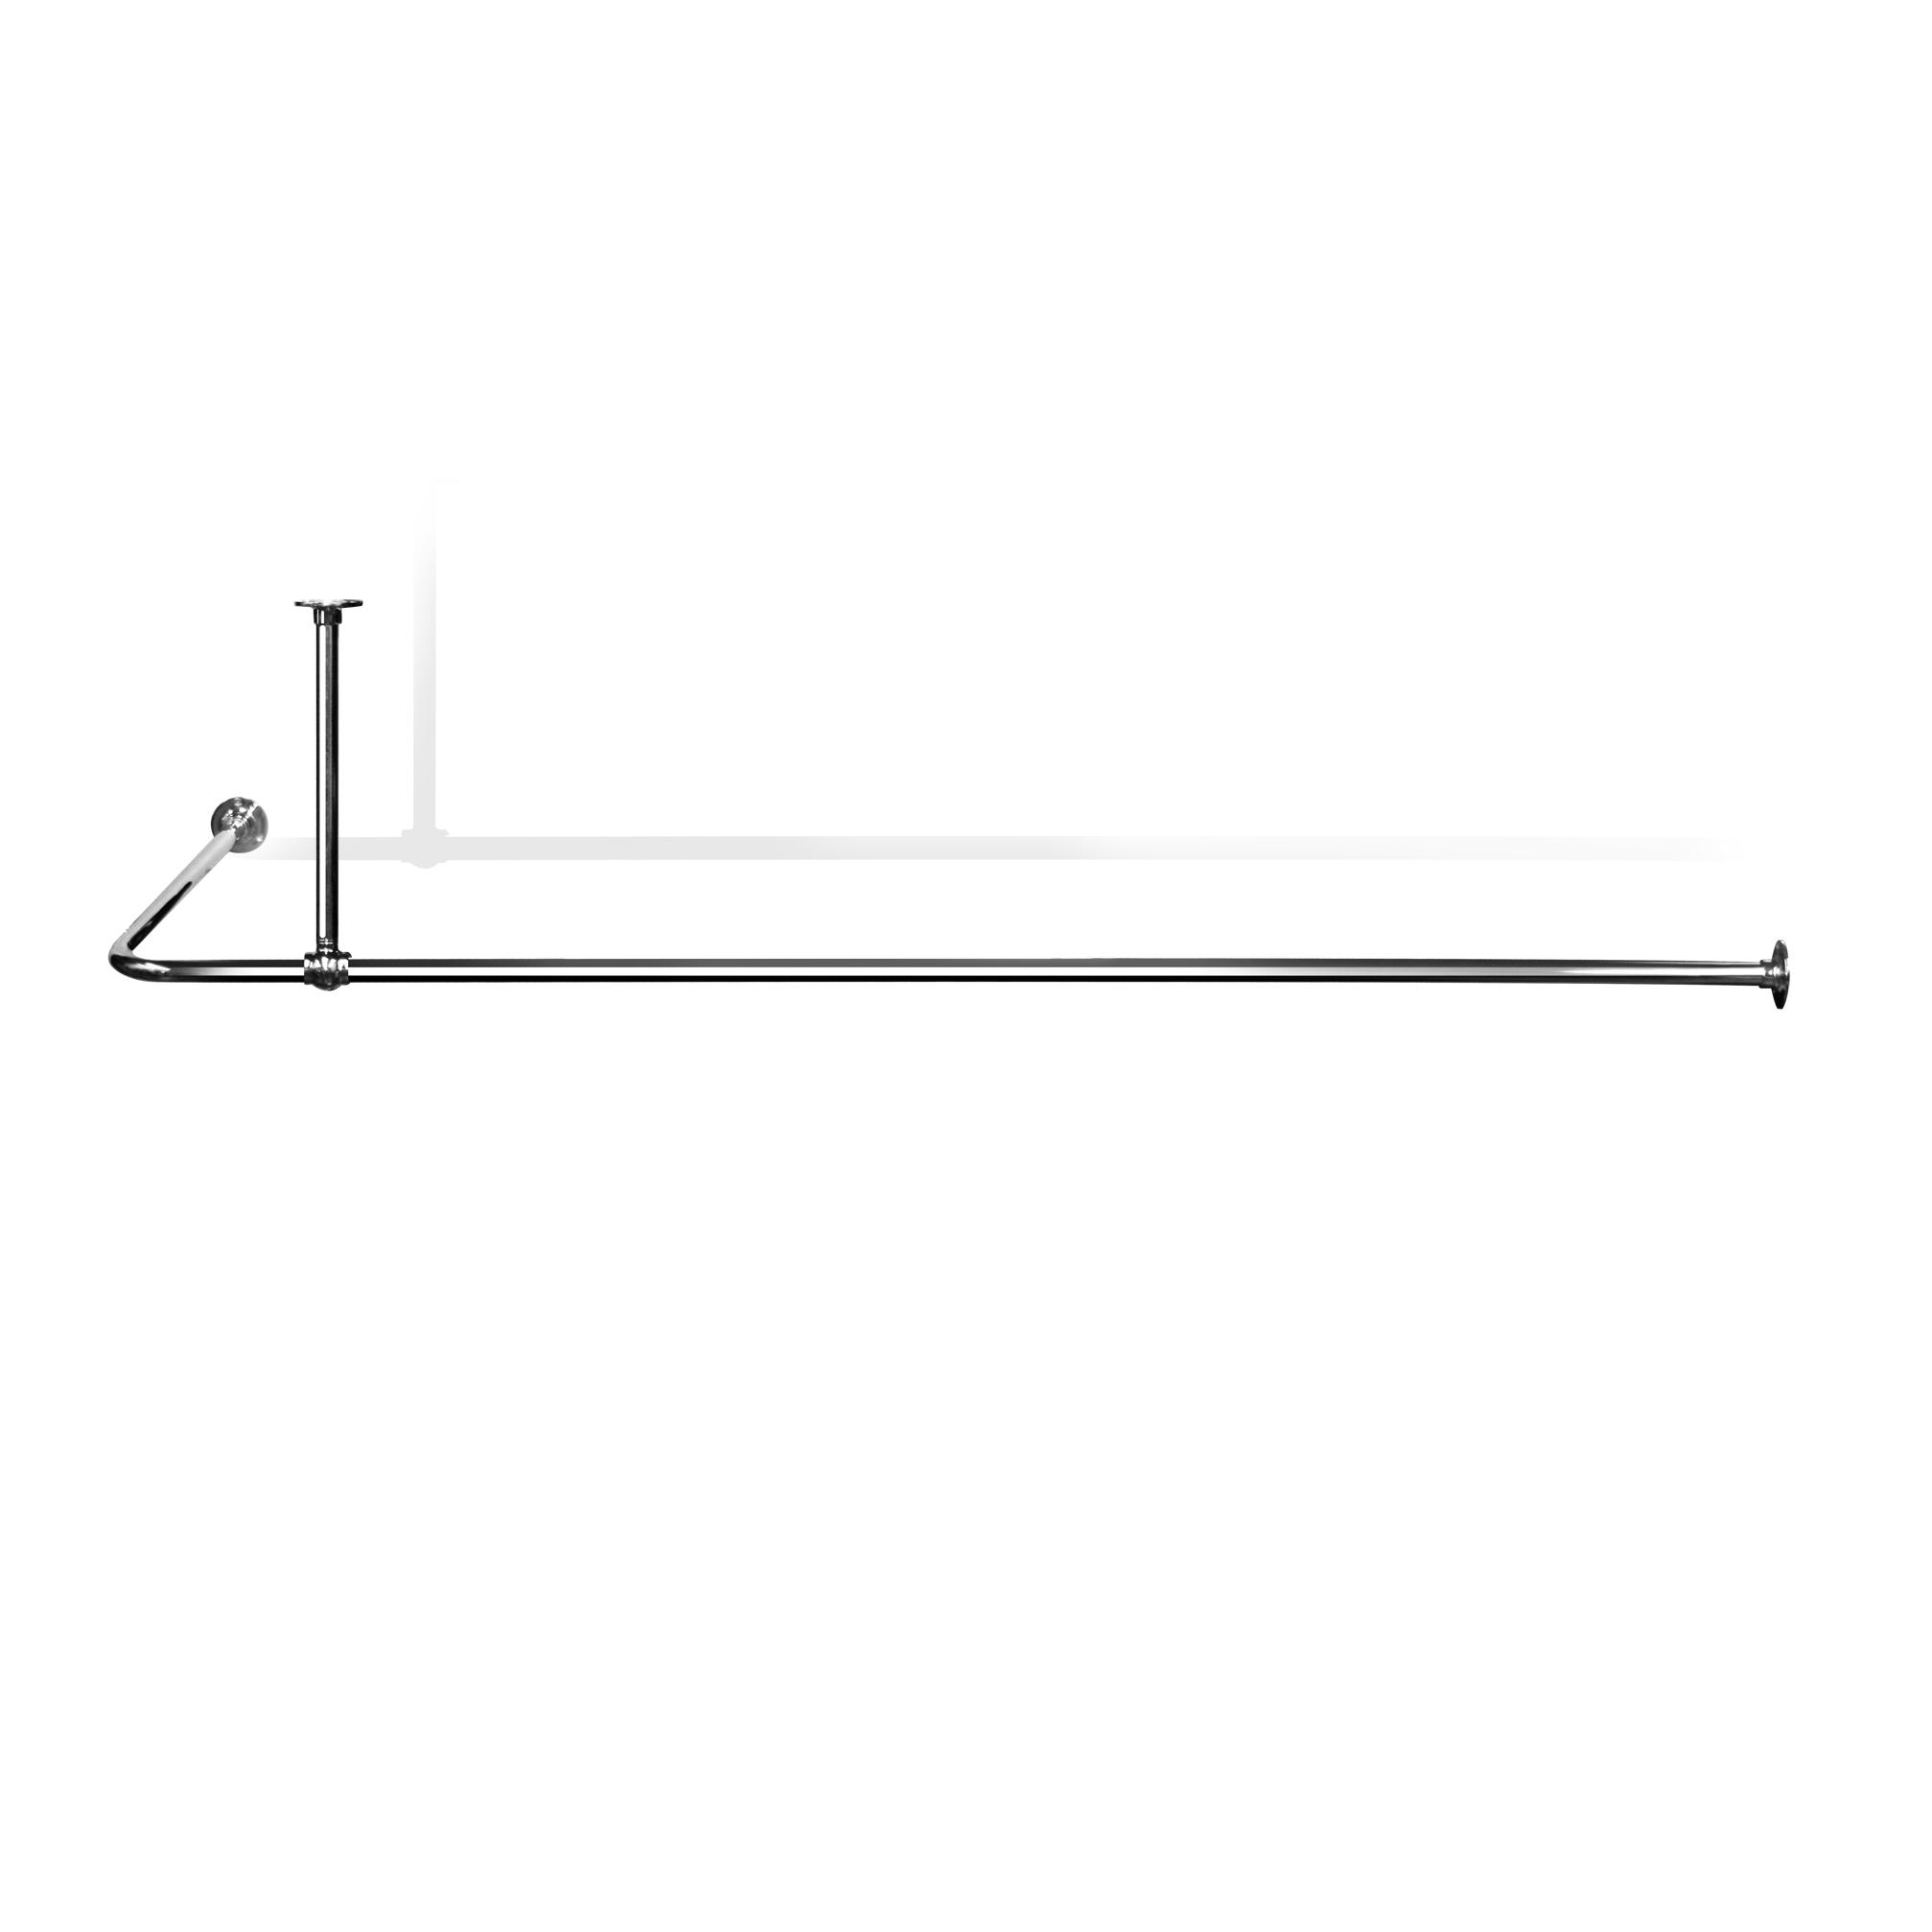 L Shaped Shower Curtain Rail Lsr4 Shower Curtain Rails